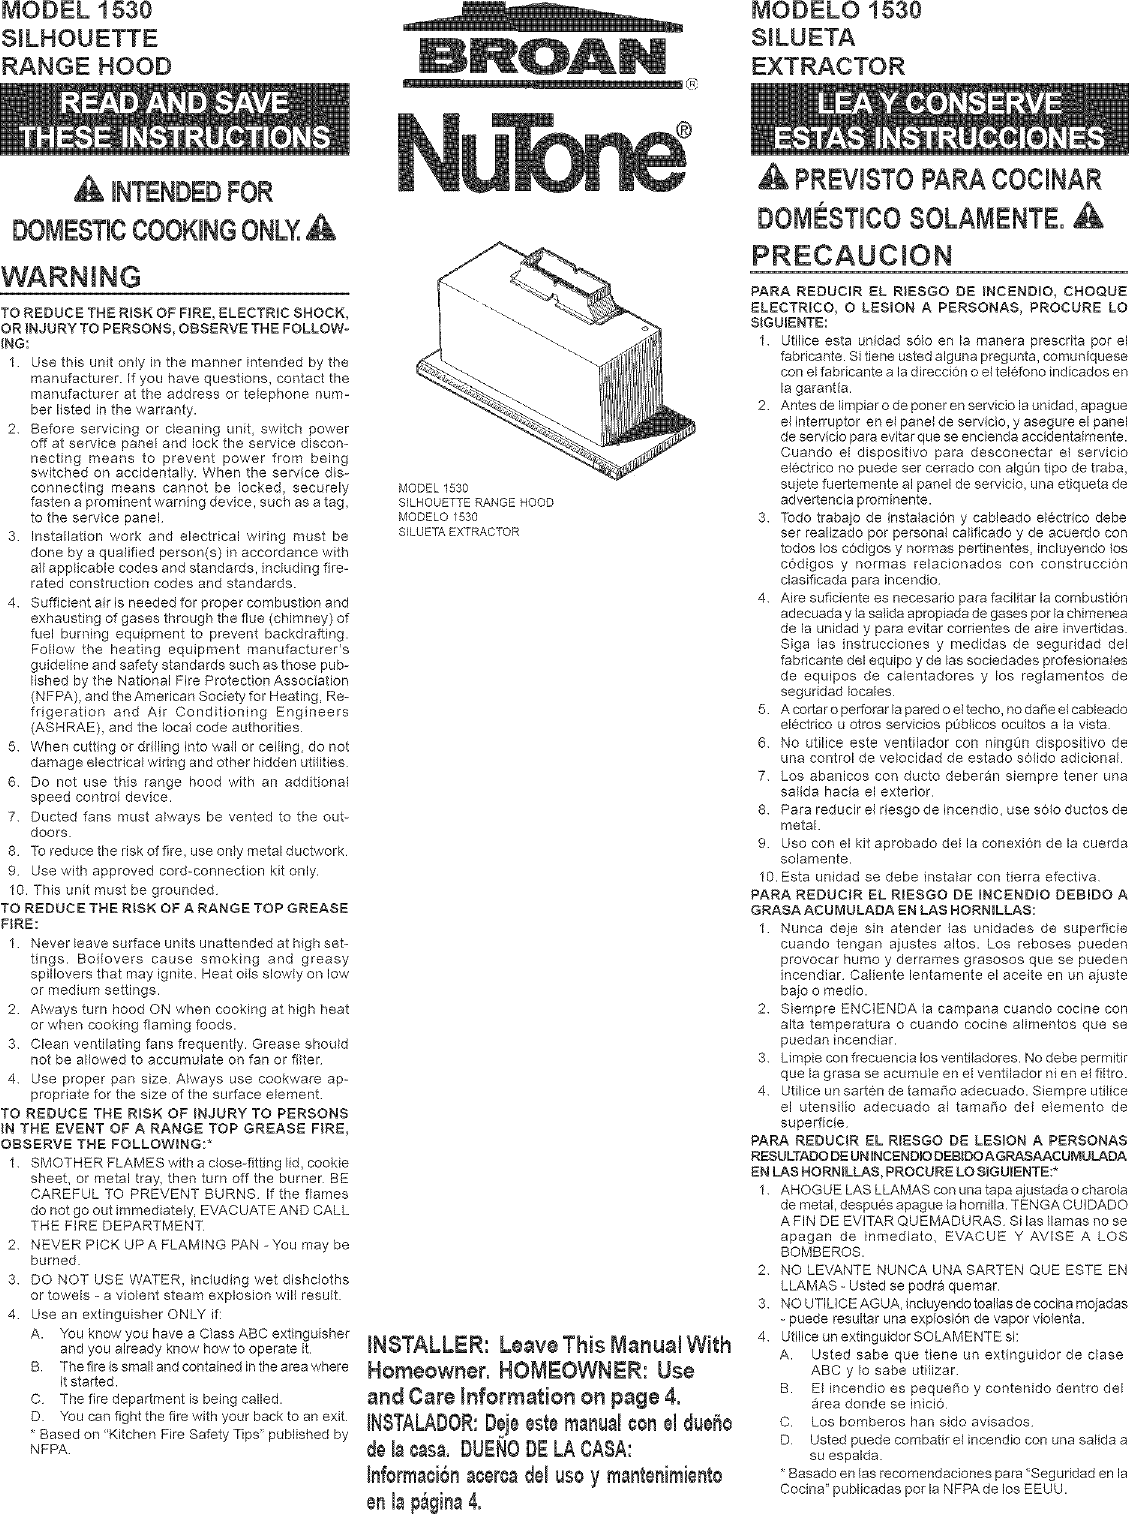 Broan 153004 User Manual RANGE HOOD Manuals And Guides